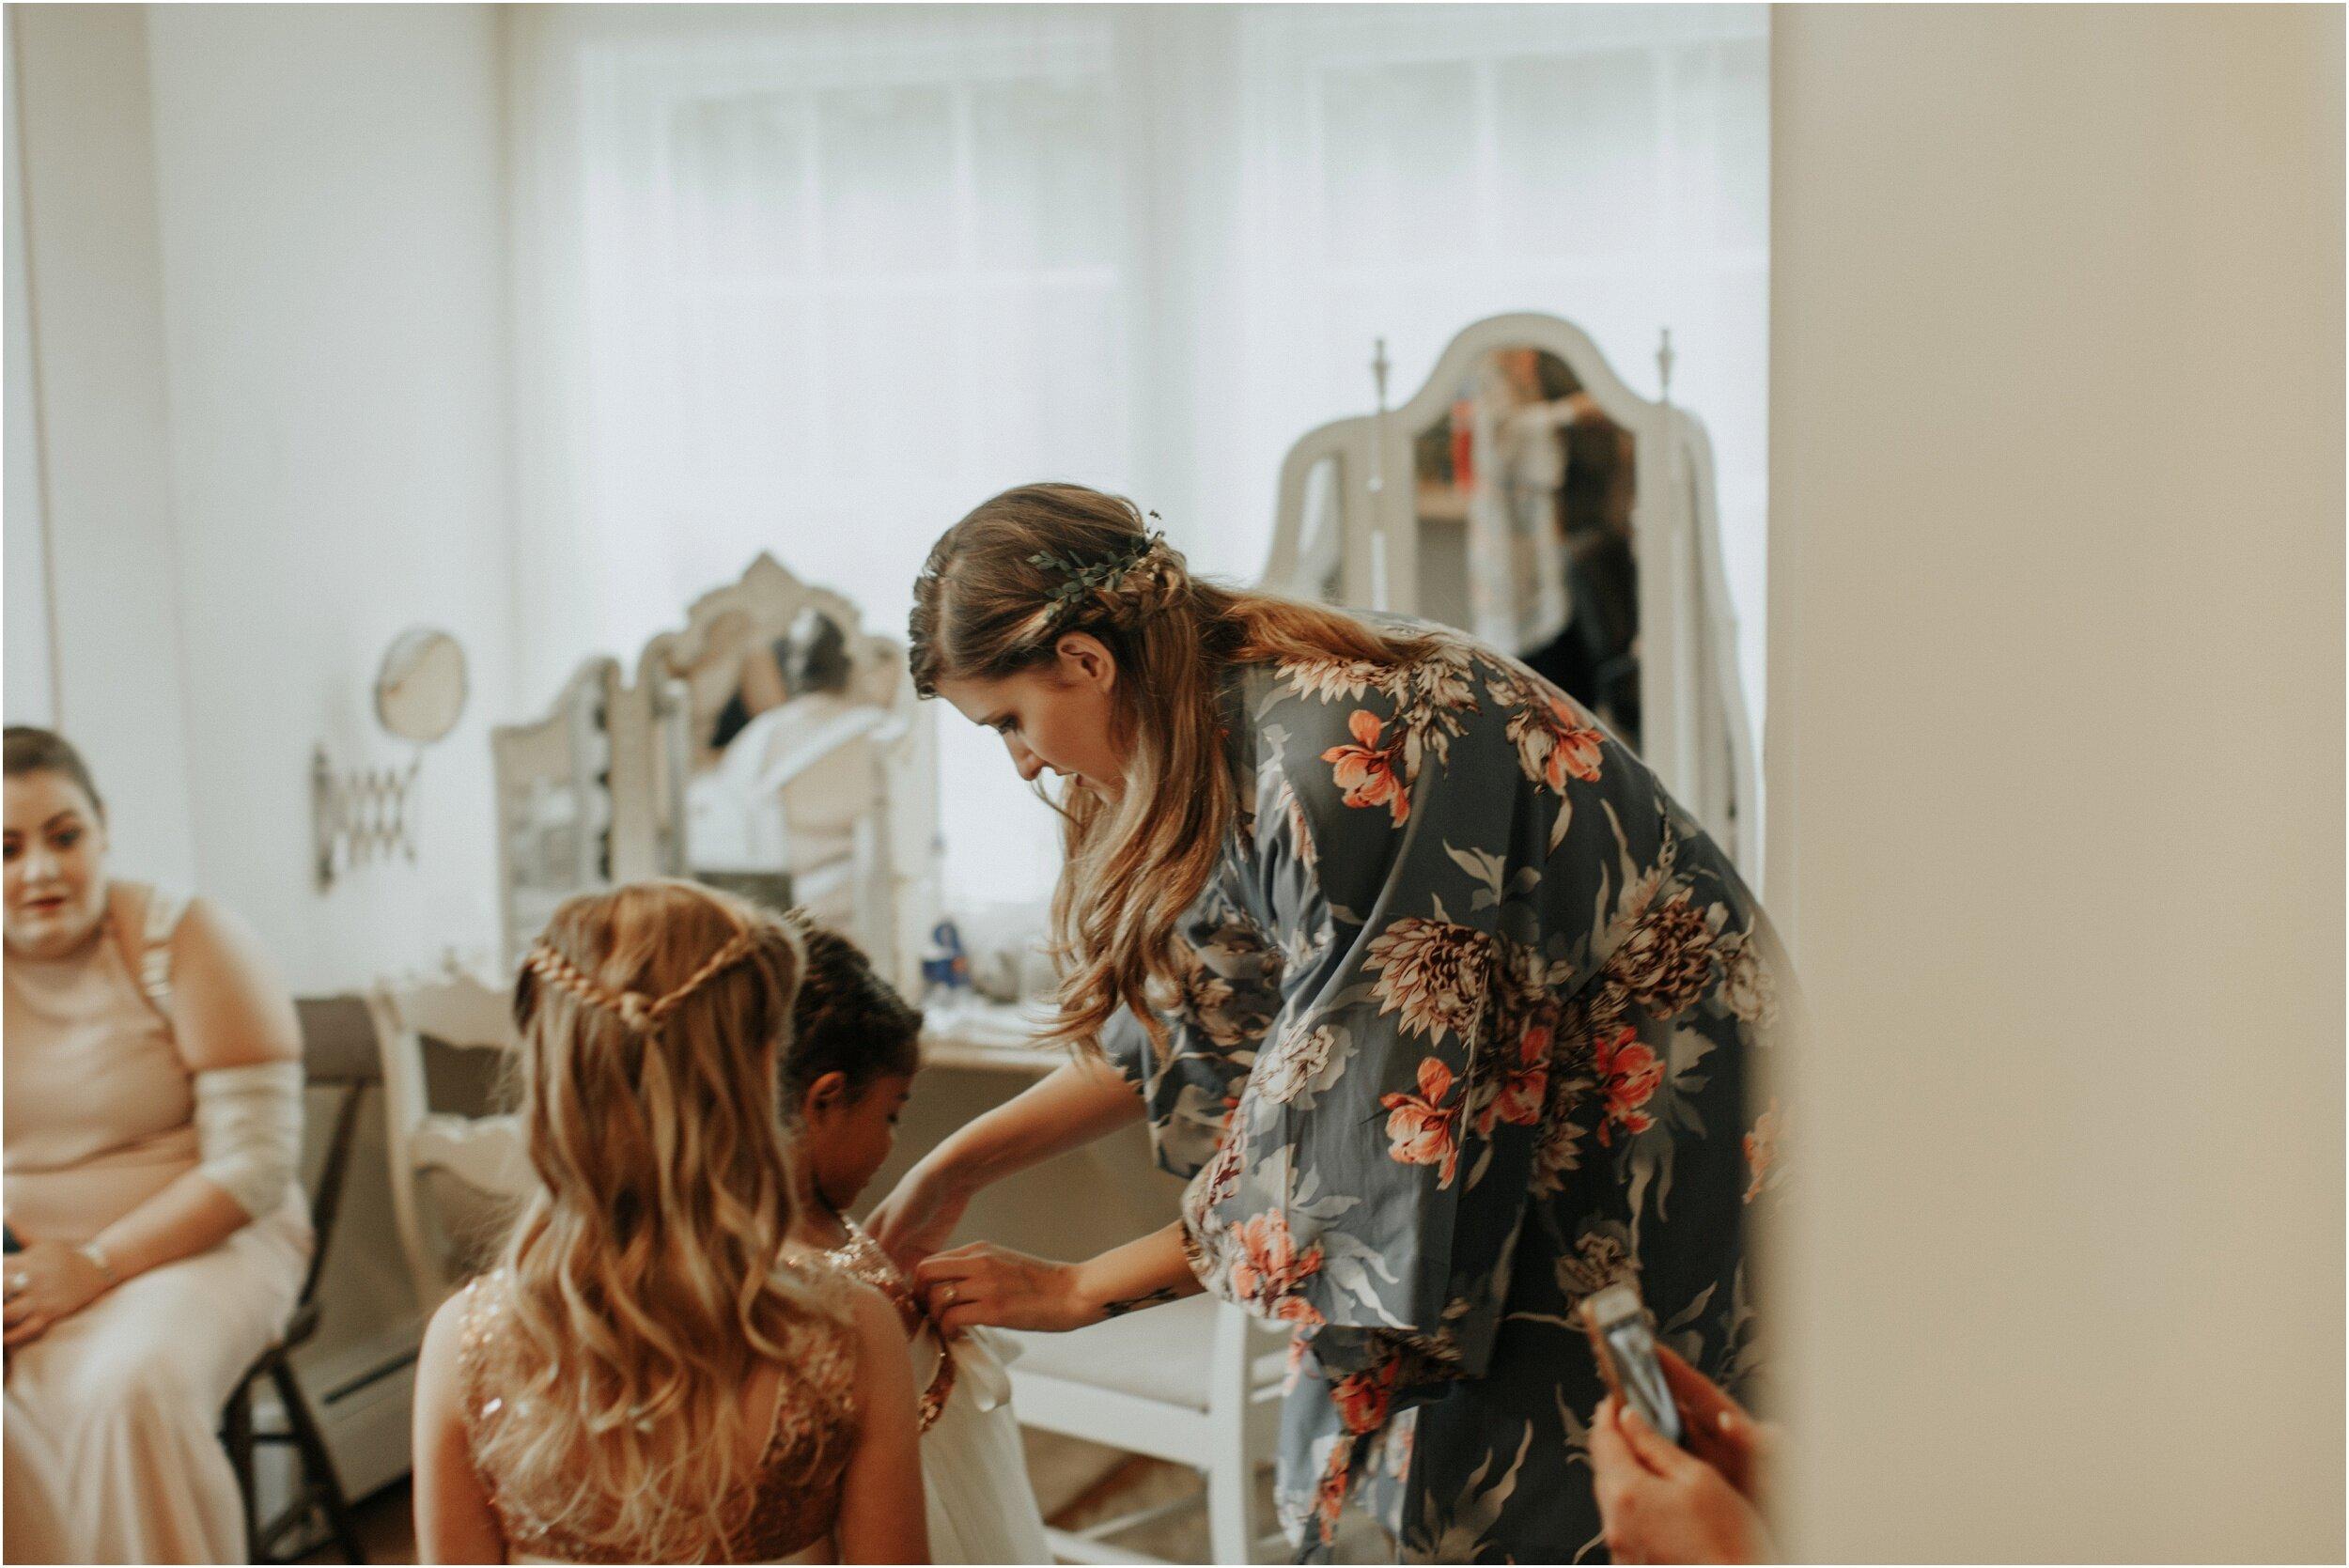 steph-and-jordan-cox-our-wedding-historic-shady-lane-compass-wedding-collective-hazel-lining-photography-destination-elopement-wedding-engagement-photography_0012.jpg